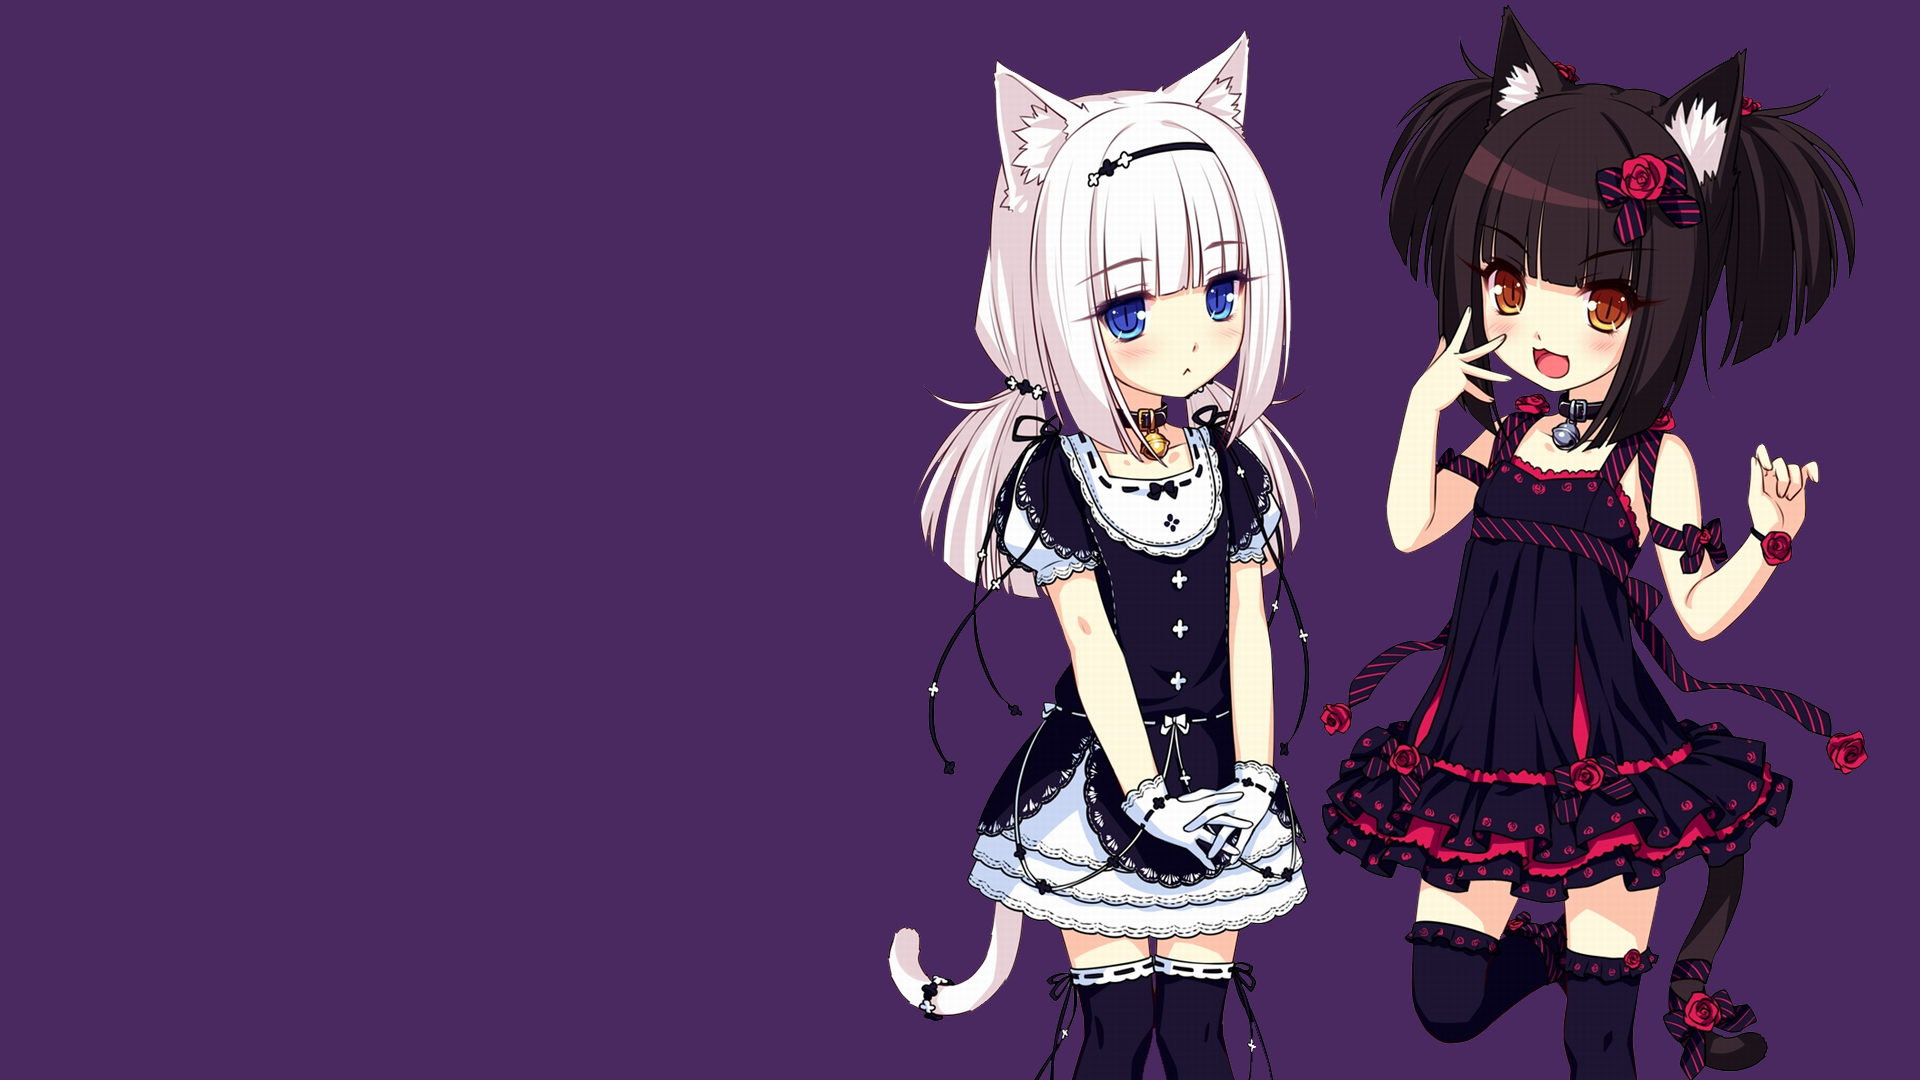 Neko Para Vanilla Neko Para Chocolat Neko Para Anime Girls Wallpaper Resolution 1920x1080 Id 108473 Wallha Com